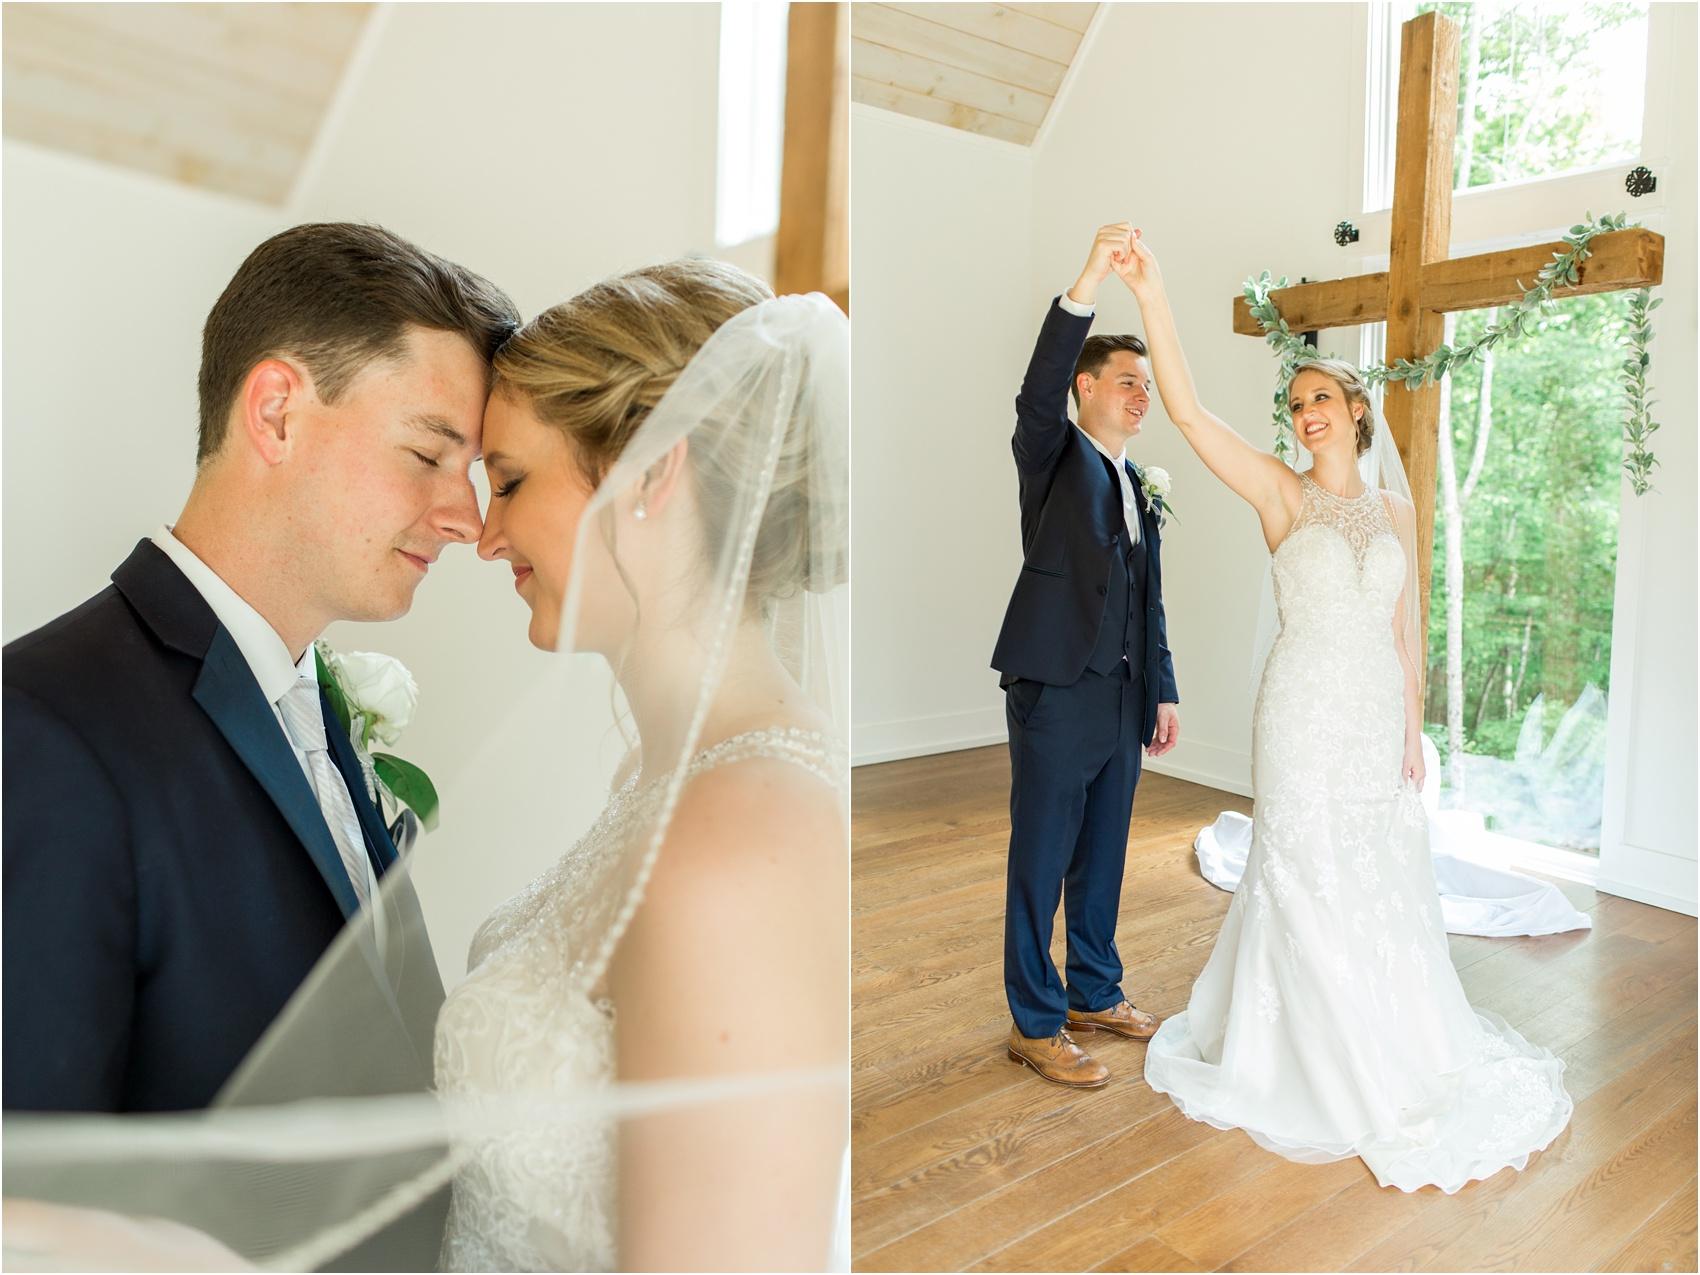 Savannah Eve Photography- Roper-Powell Wedding- Blog-48.jpg